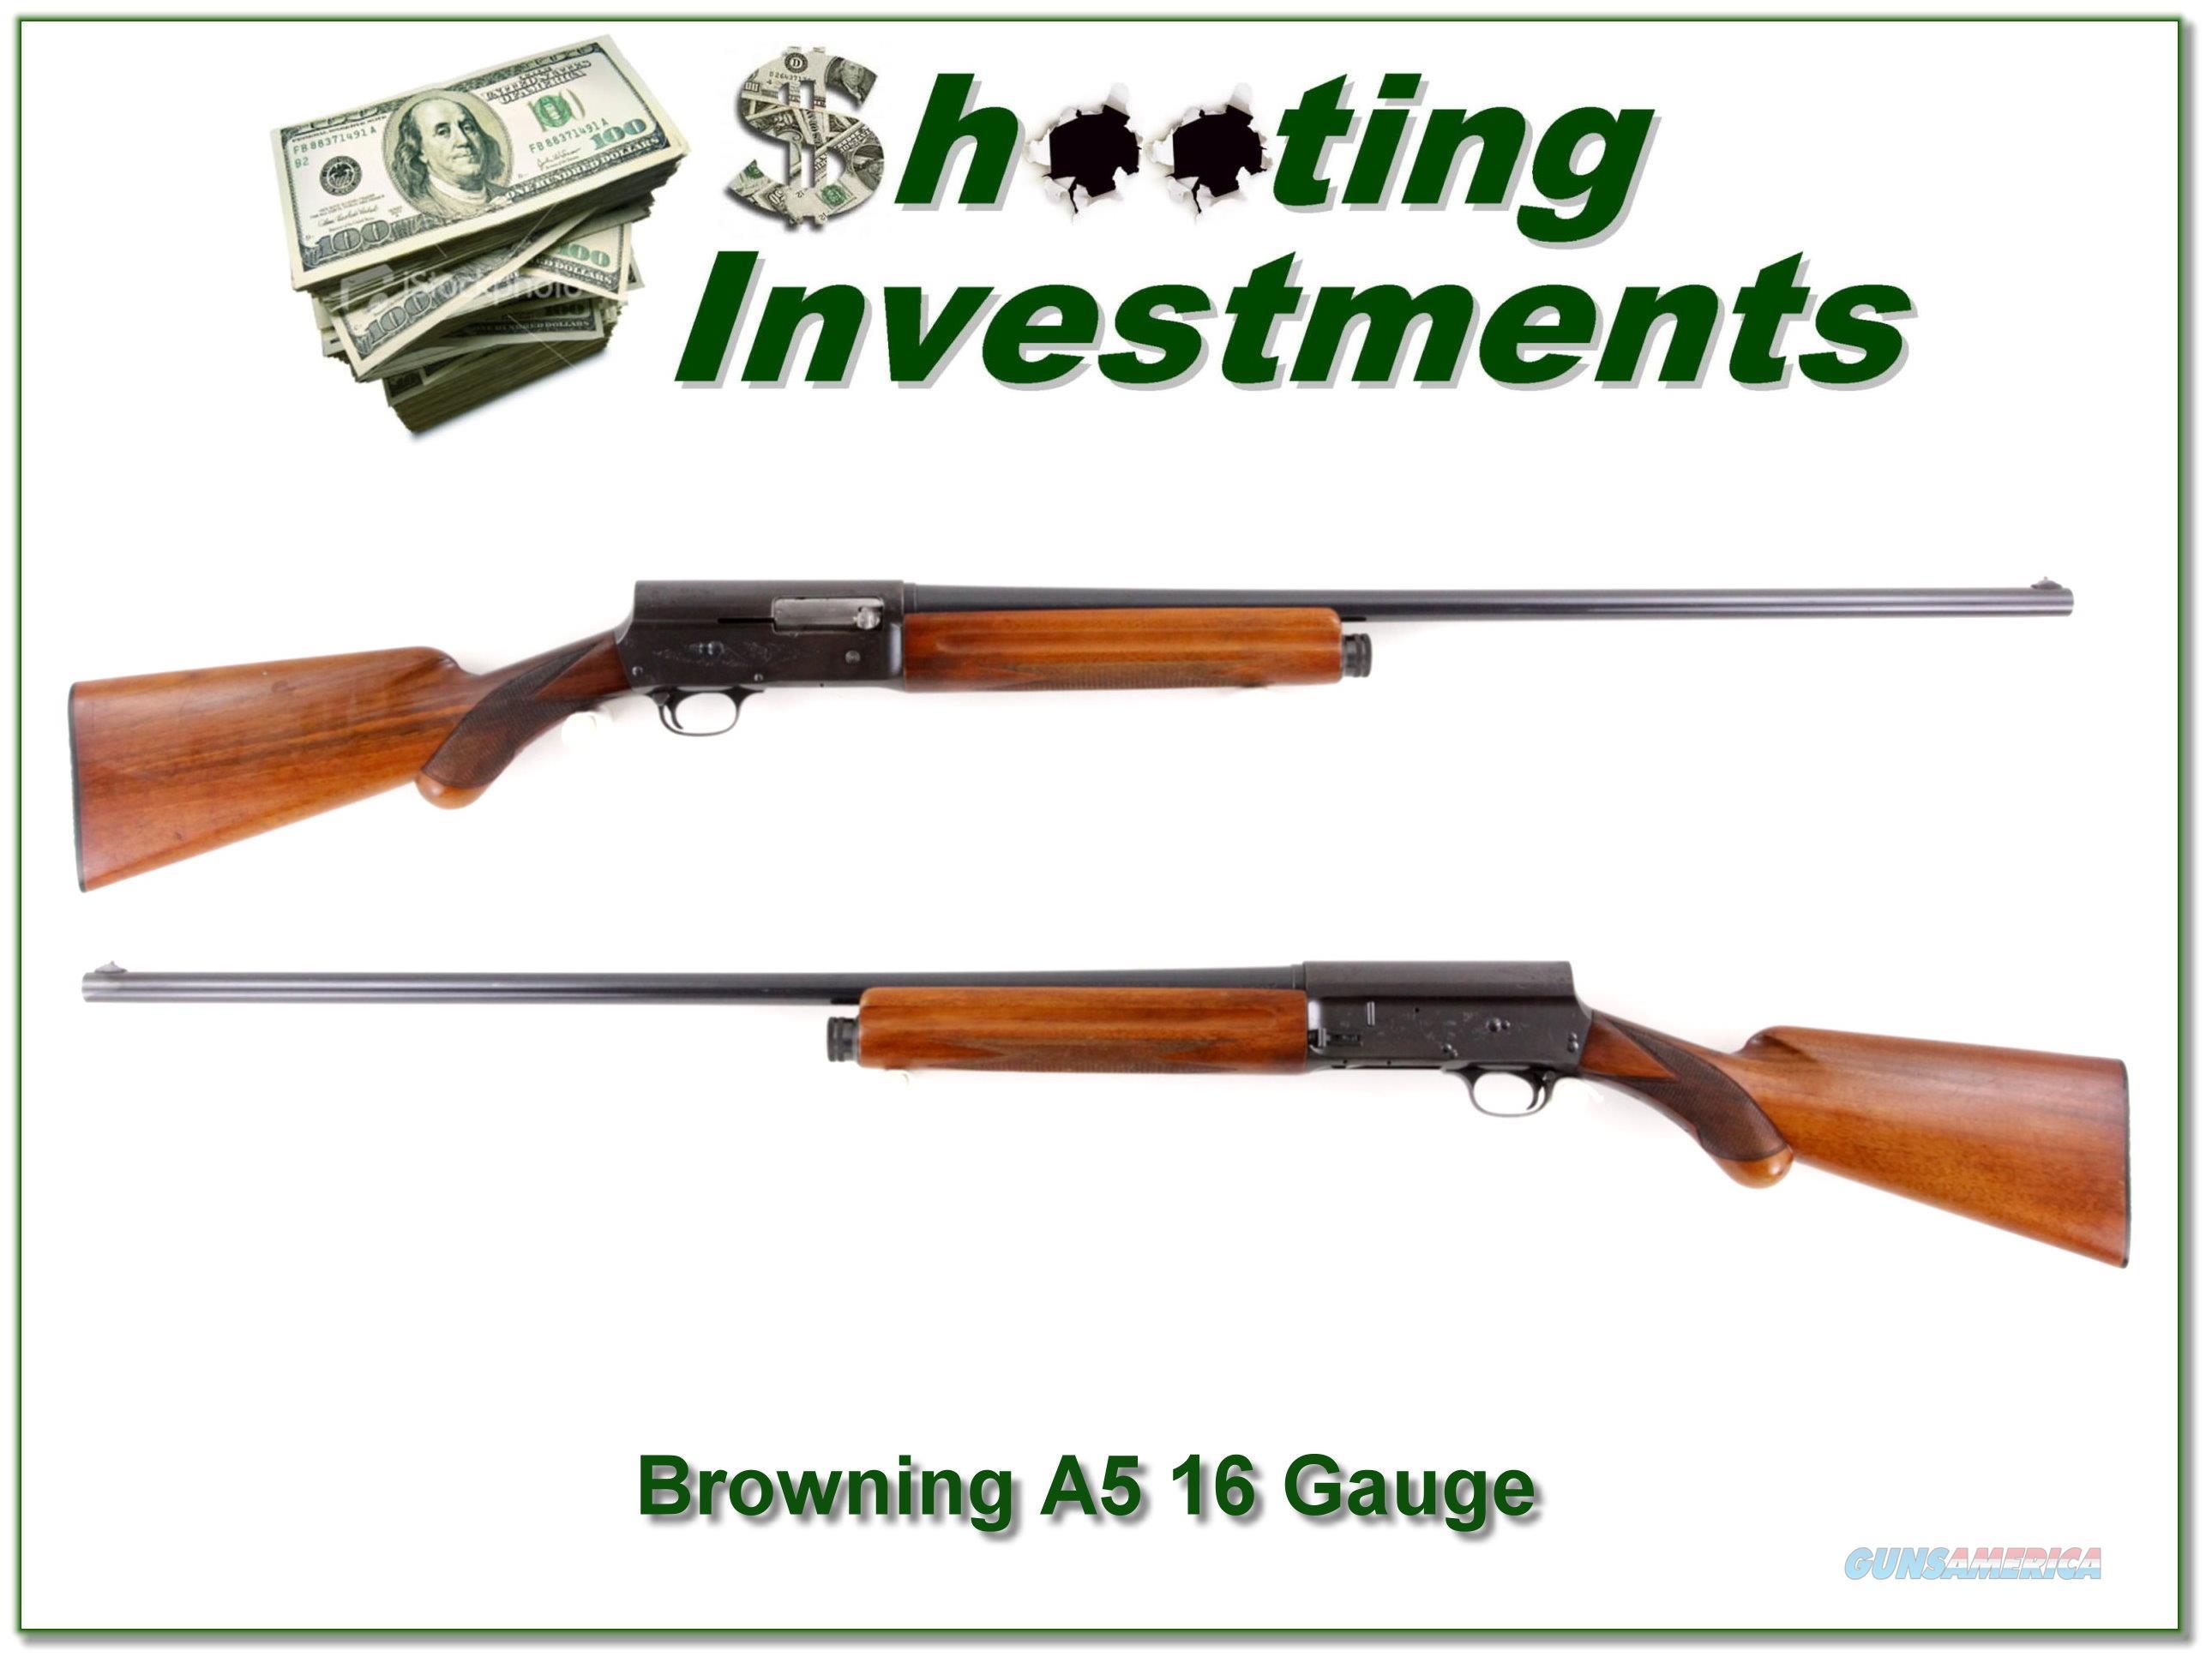 Browning A5 16 63 Belgium 30in full